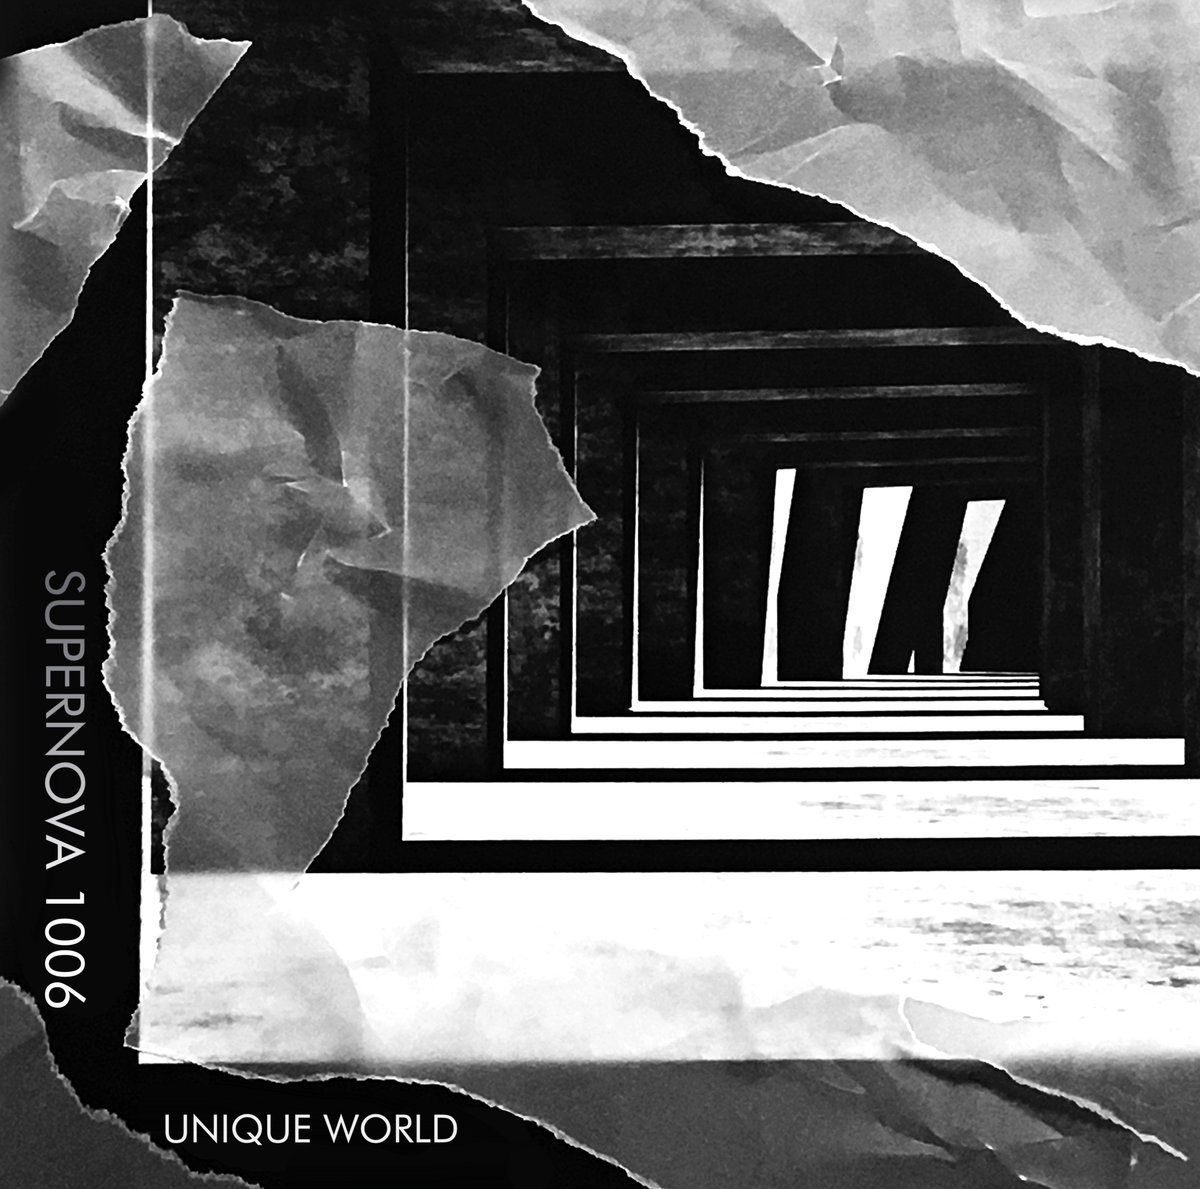 Supernova 1006 - Unique World (LP; 2017)